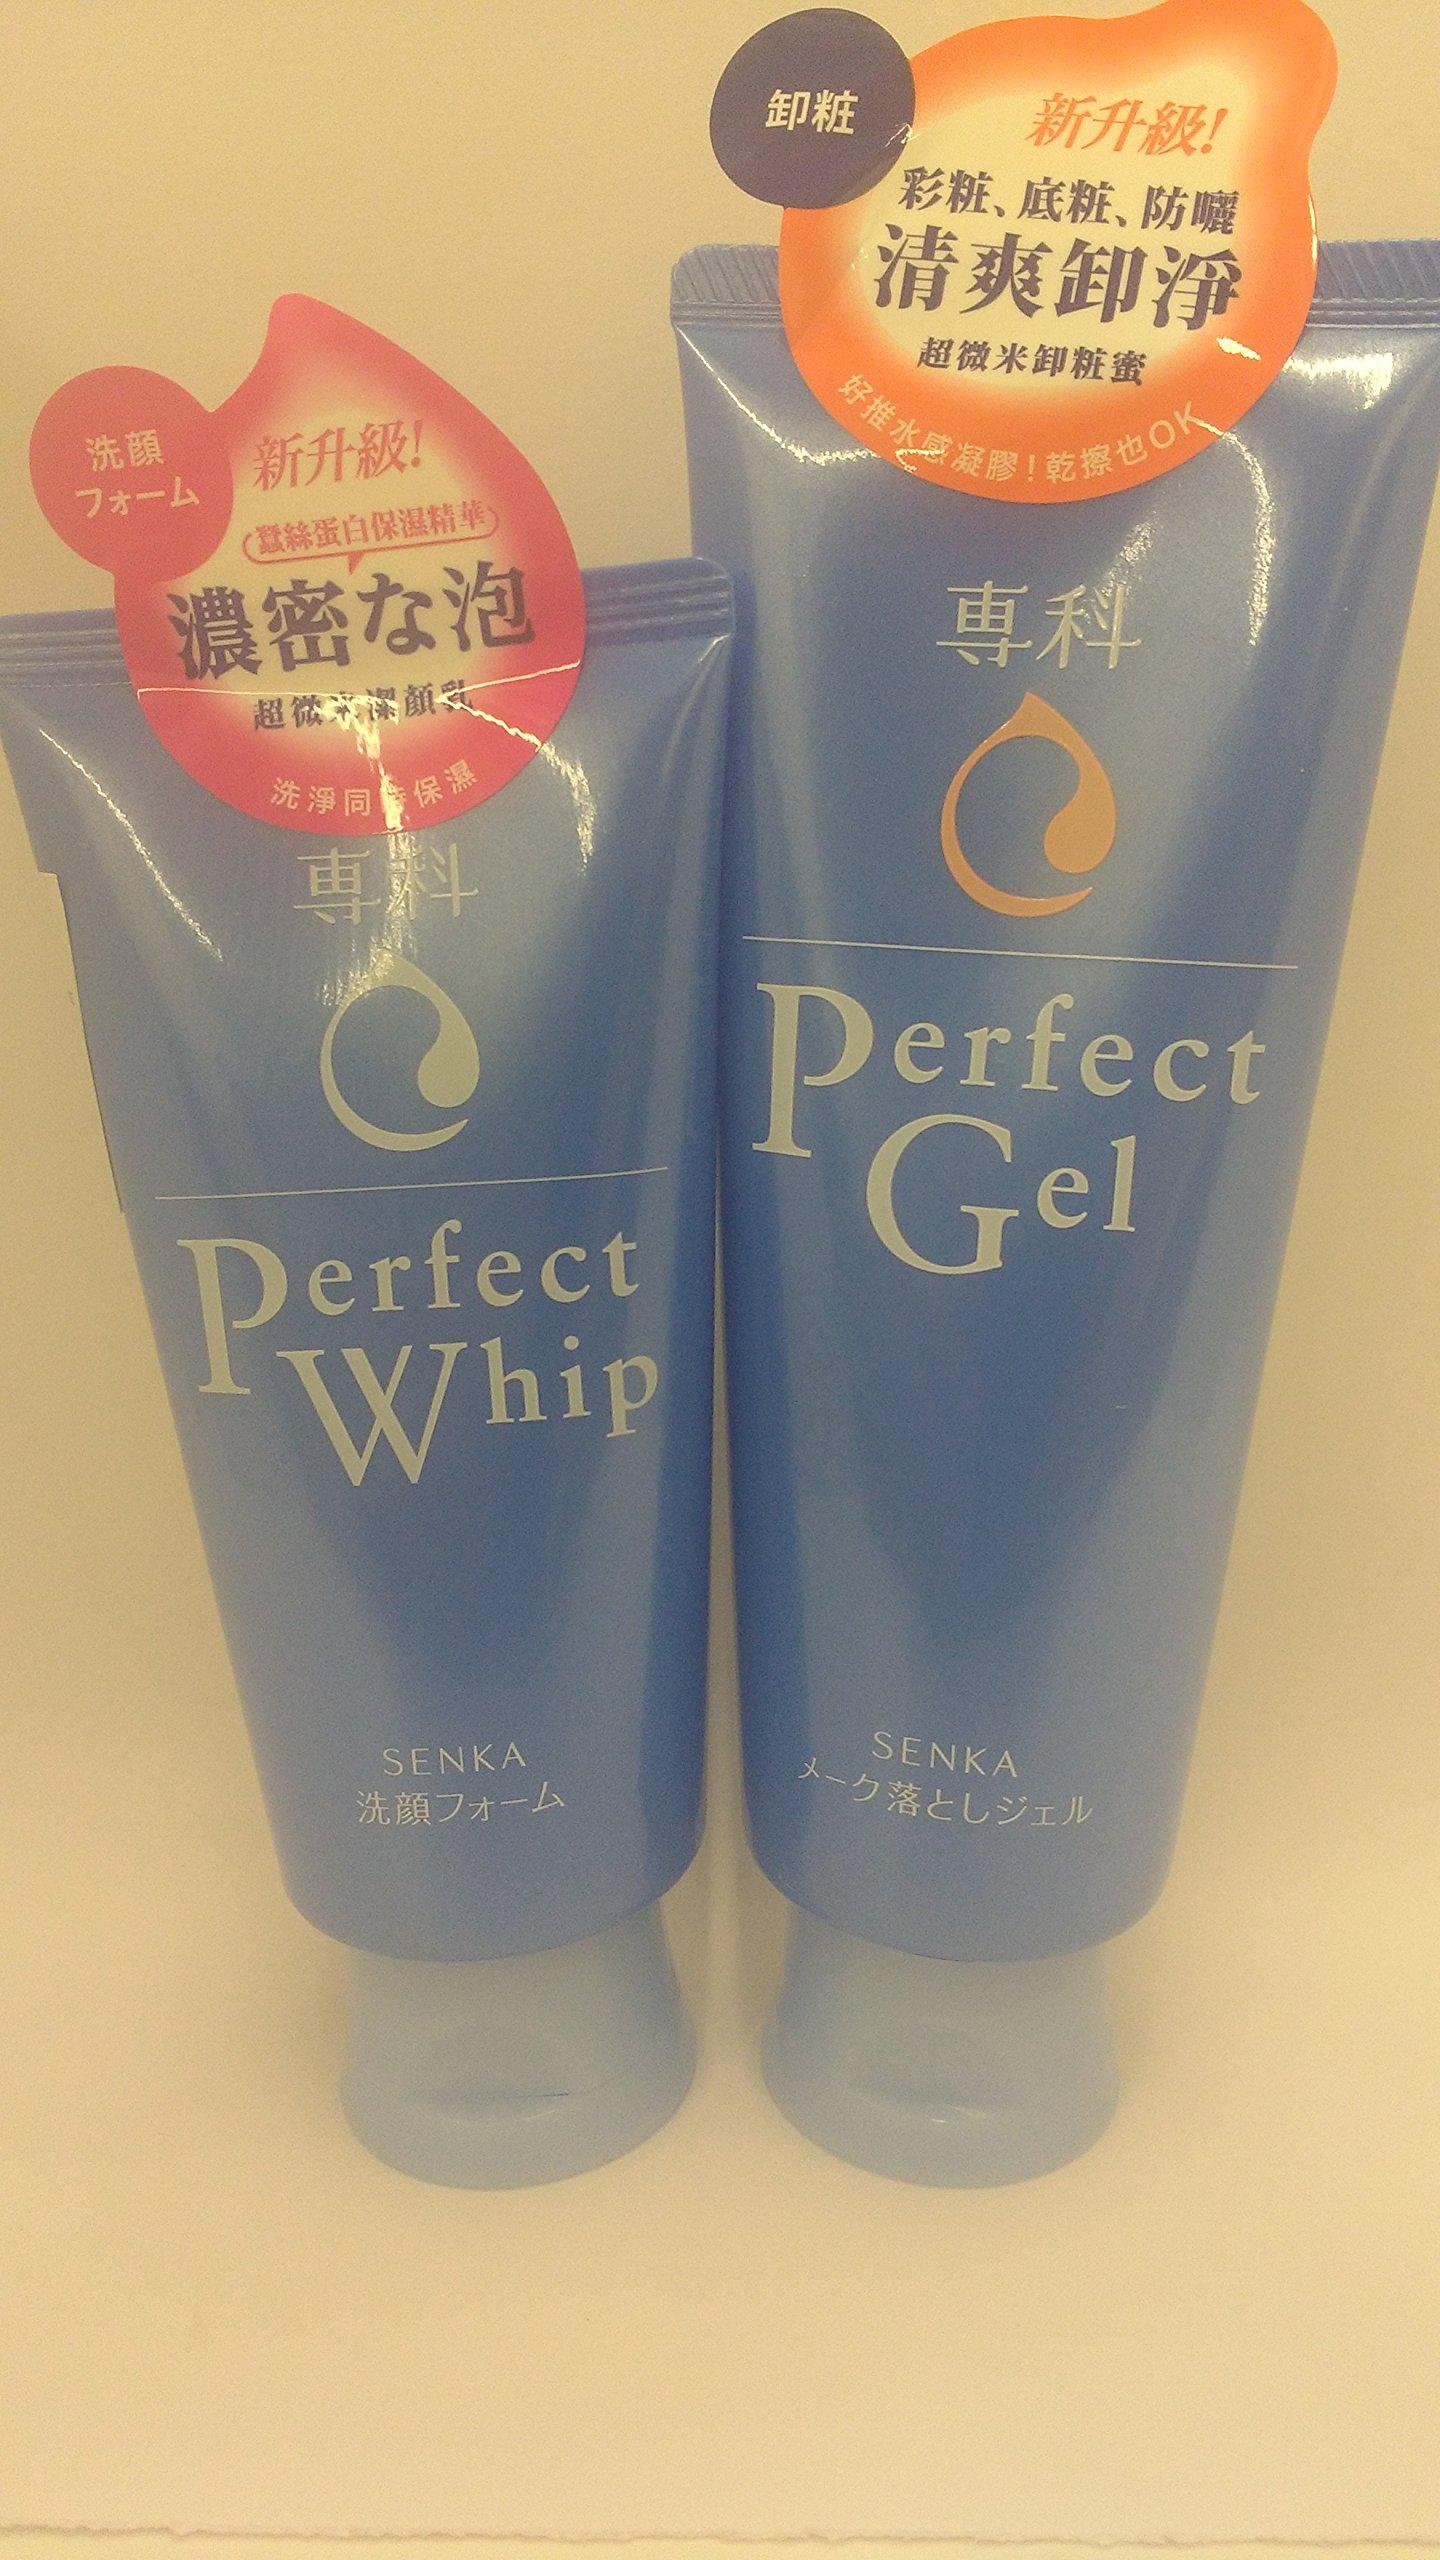 Shiseido FT SenganSenka Perfect Gel Makeup Cleansing 160g and Perfect Whip Facial Wash 120g set by SHISEIDO